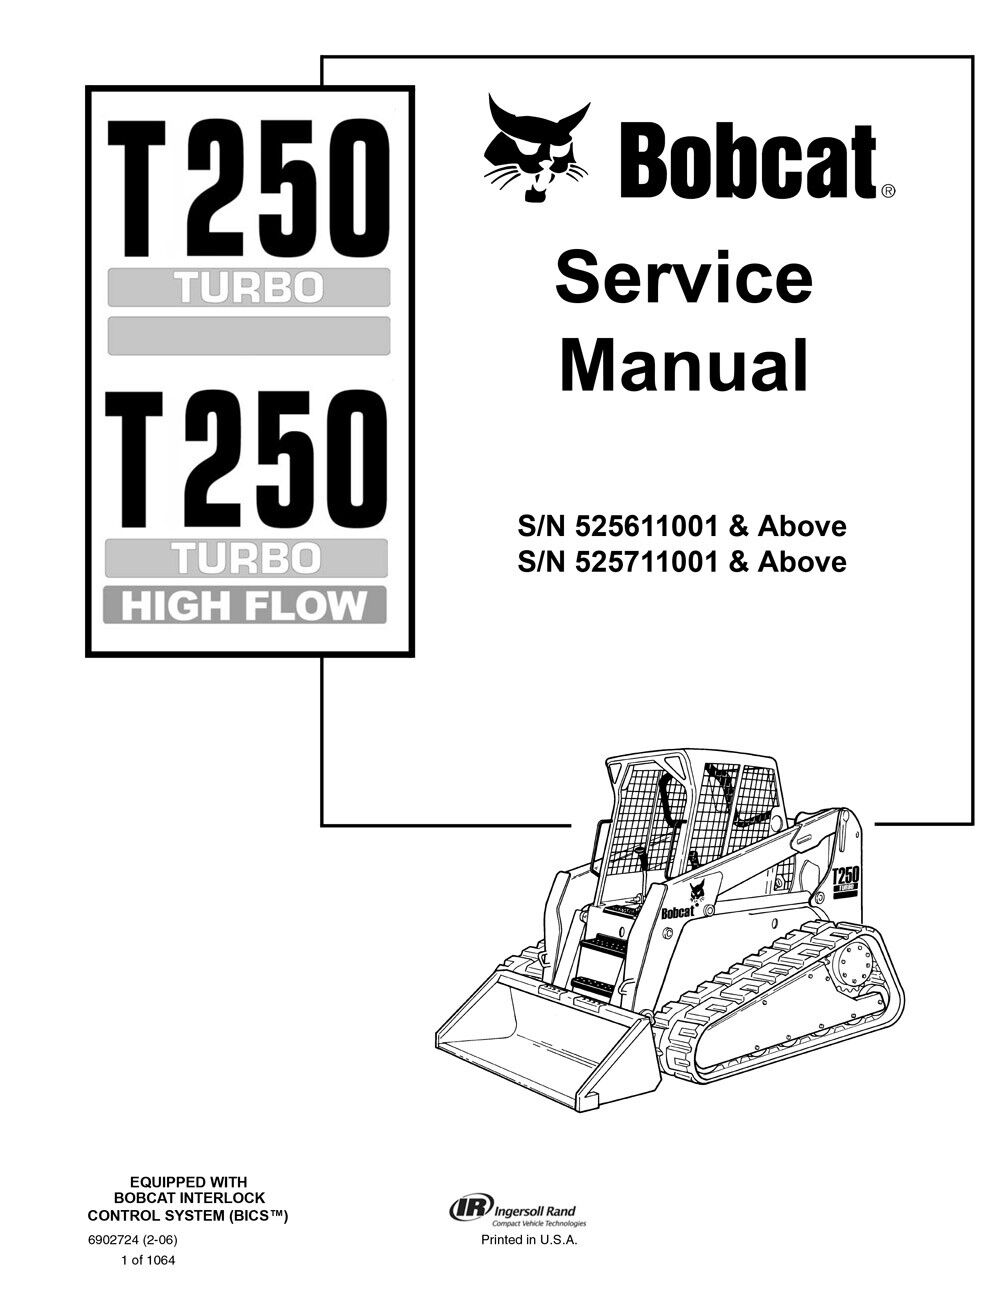 New Bobcat T250 Turbo & Highflow 2006 Edition Loader